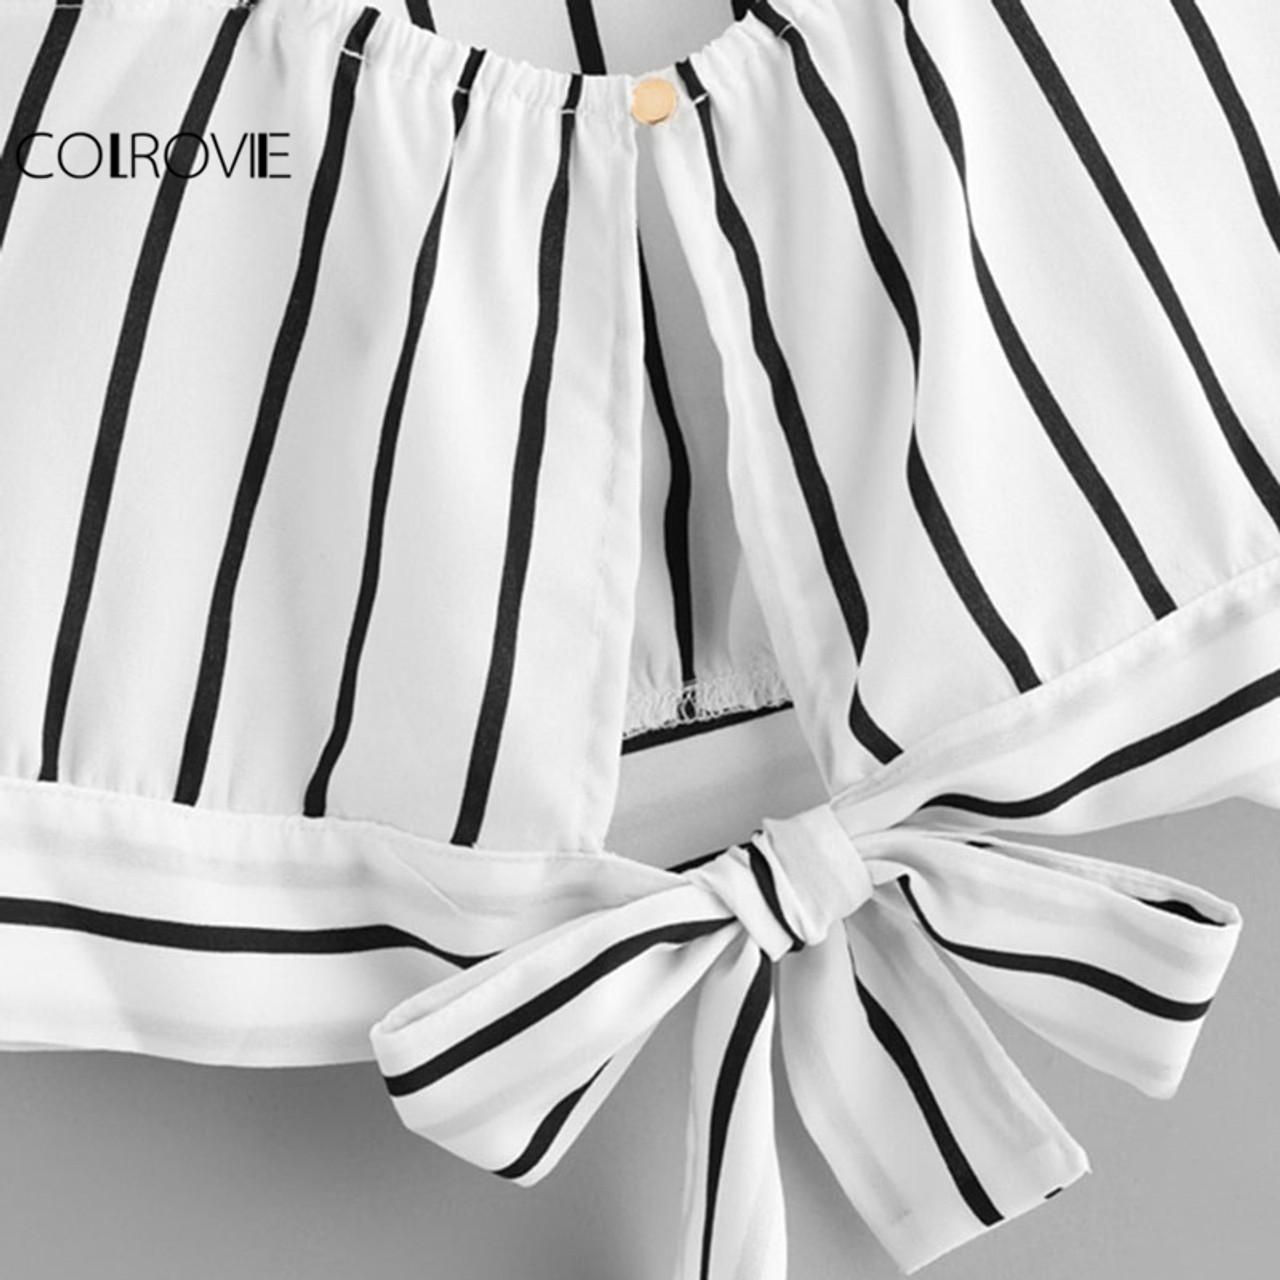 f0497406cda26 ... COLROVIE Striped Split Tie Back Crop Cami Top Women Casual Spaghetti  Strap Bow Top Vest 2018 ...